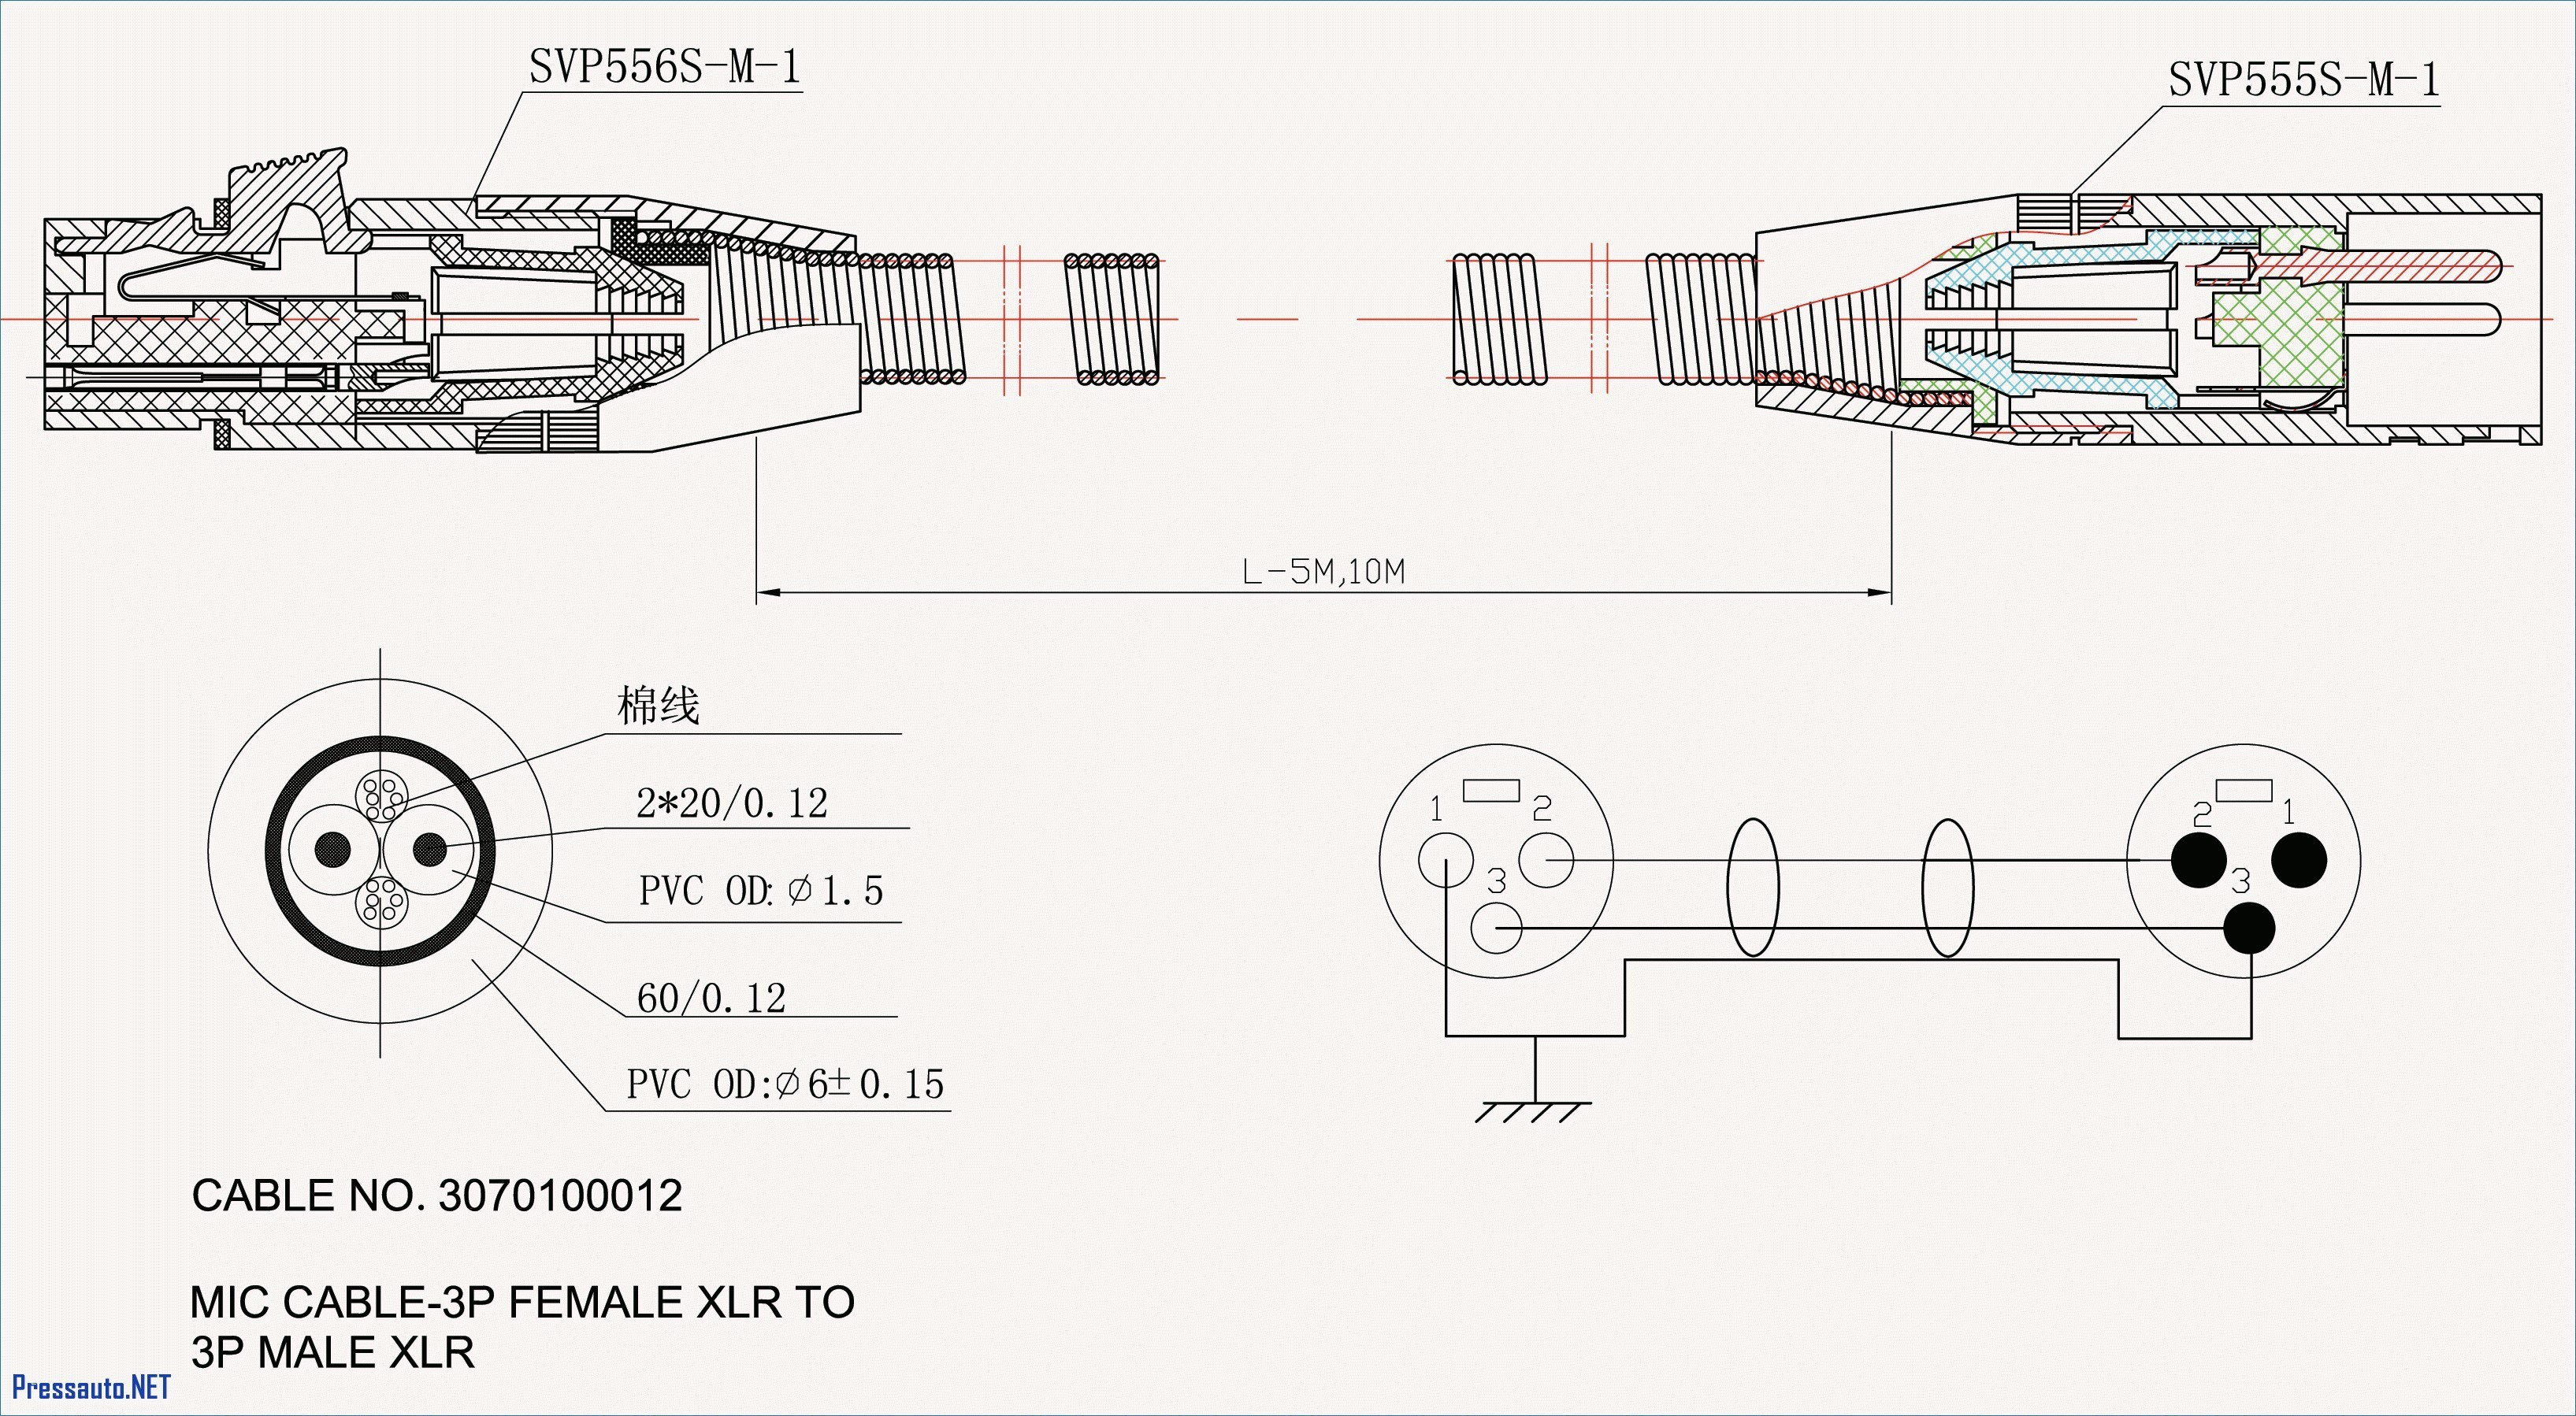 30 Amp Twist Lock Plug Wiring Diagram Unique New 4 Prong Beauteous